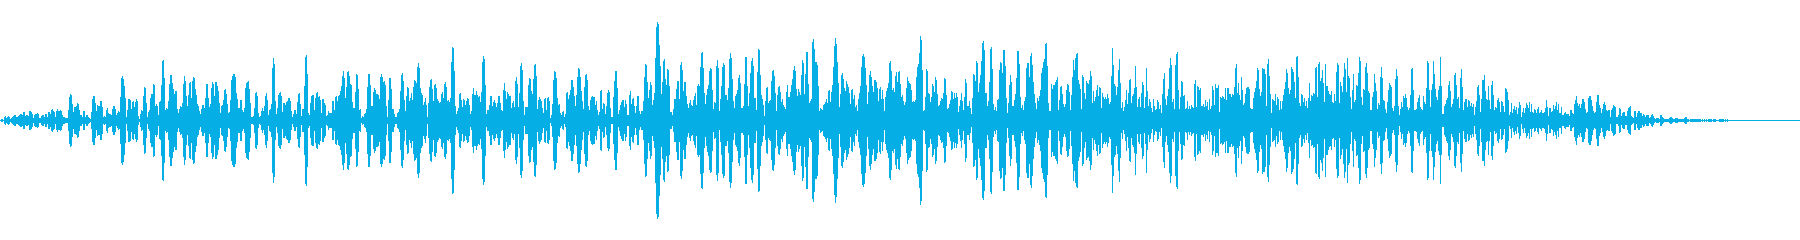 LC IMPフレーム8Cの再生済みの波形